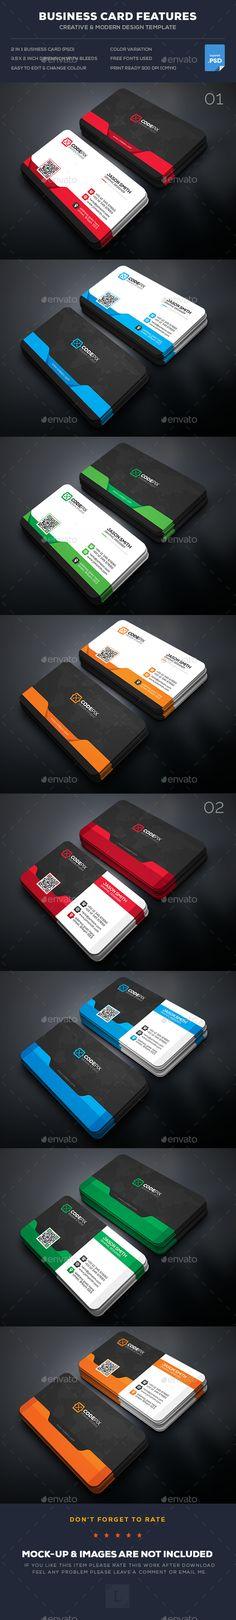 Business Card Template PSD Bundle